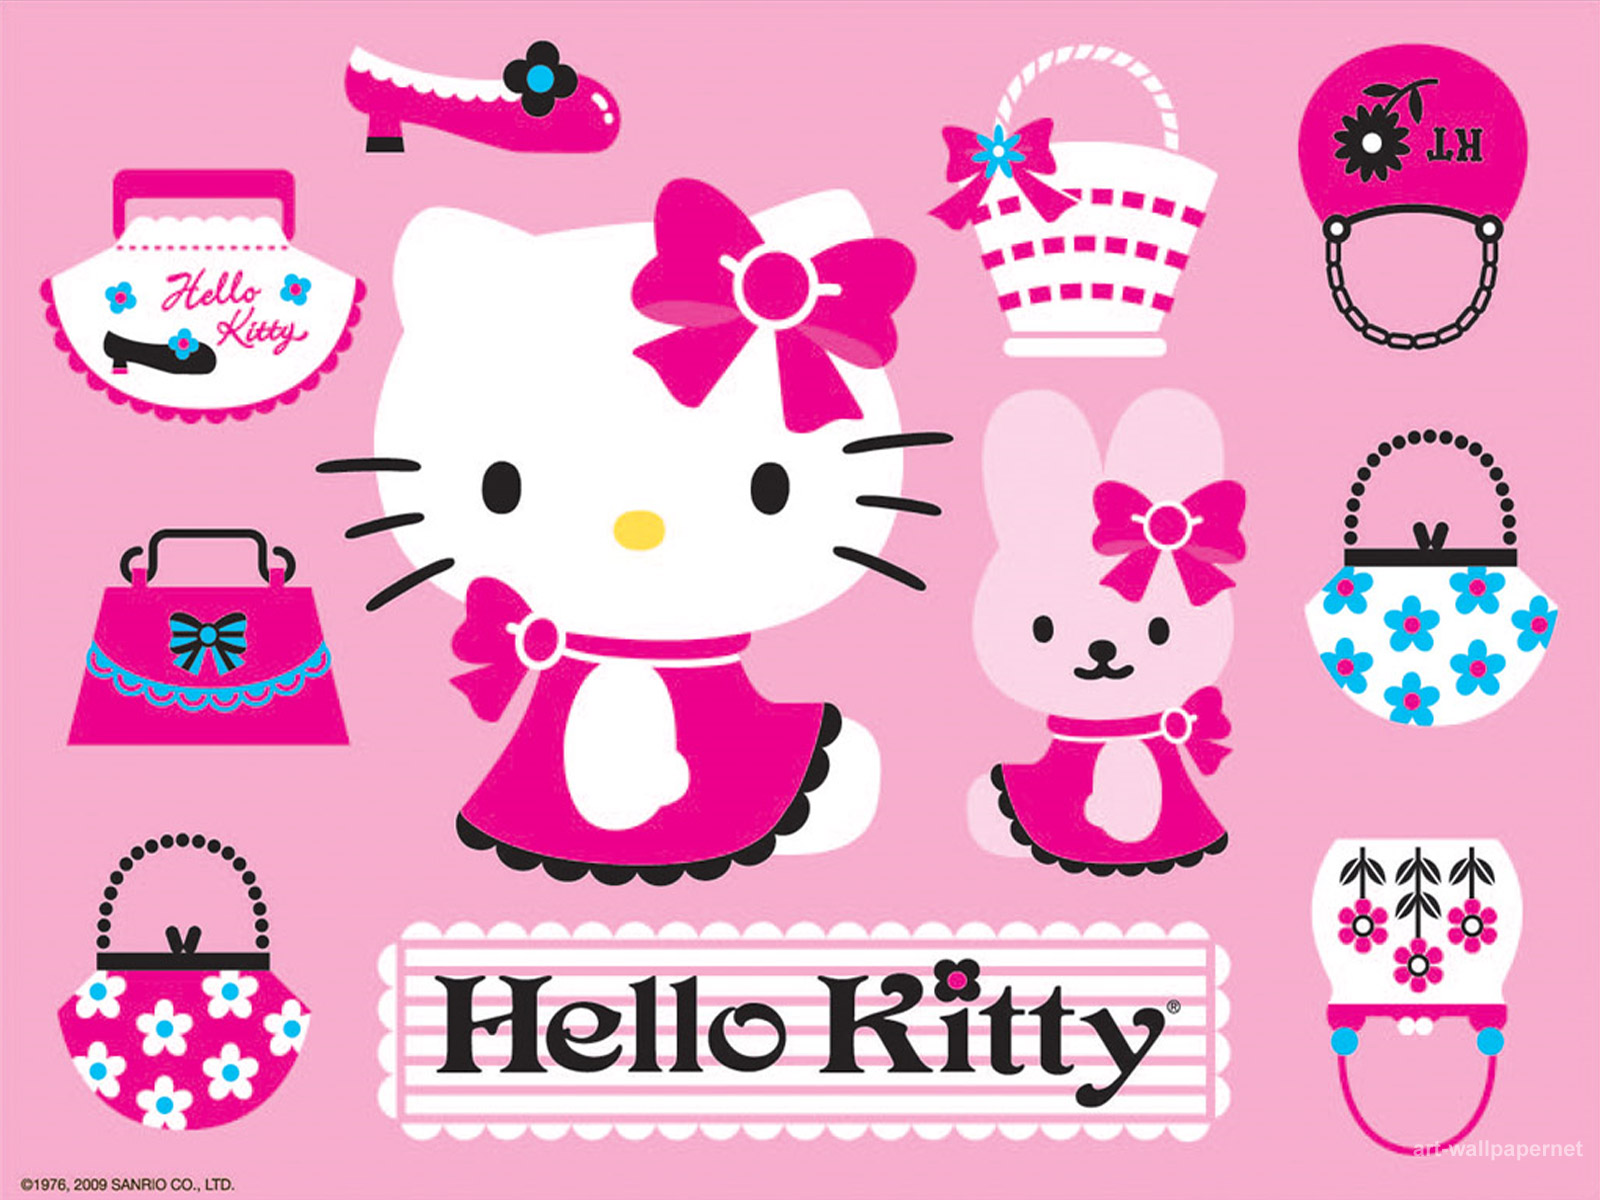 793237079 50+] High Resolution Hello Kitty Wallpaper on WallpaperSafari